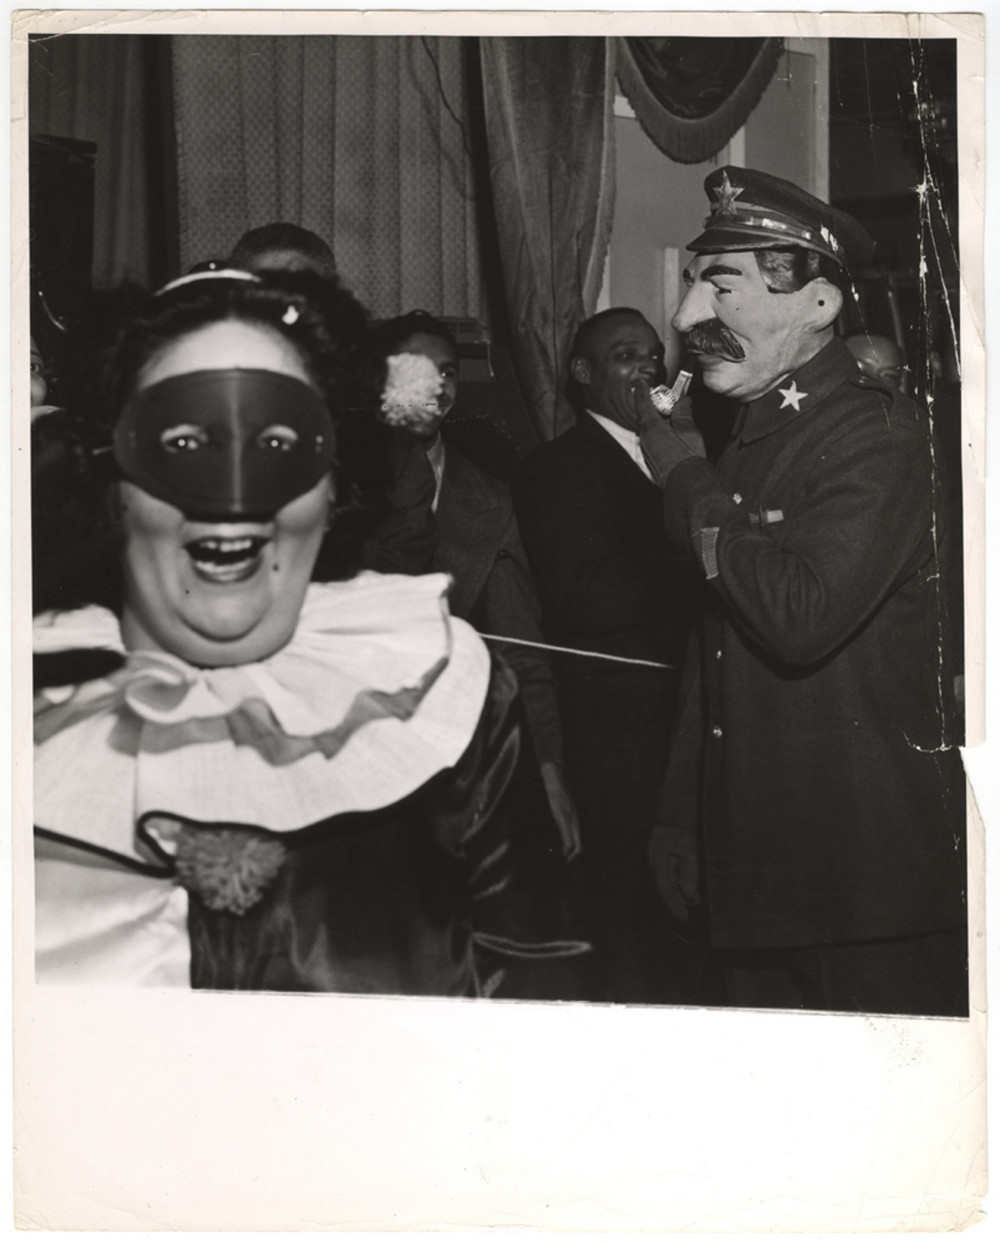 Bal-Maskarad_Uoldorf_Astoriia_Niu-Iork_1943